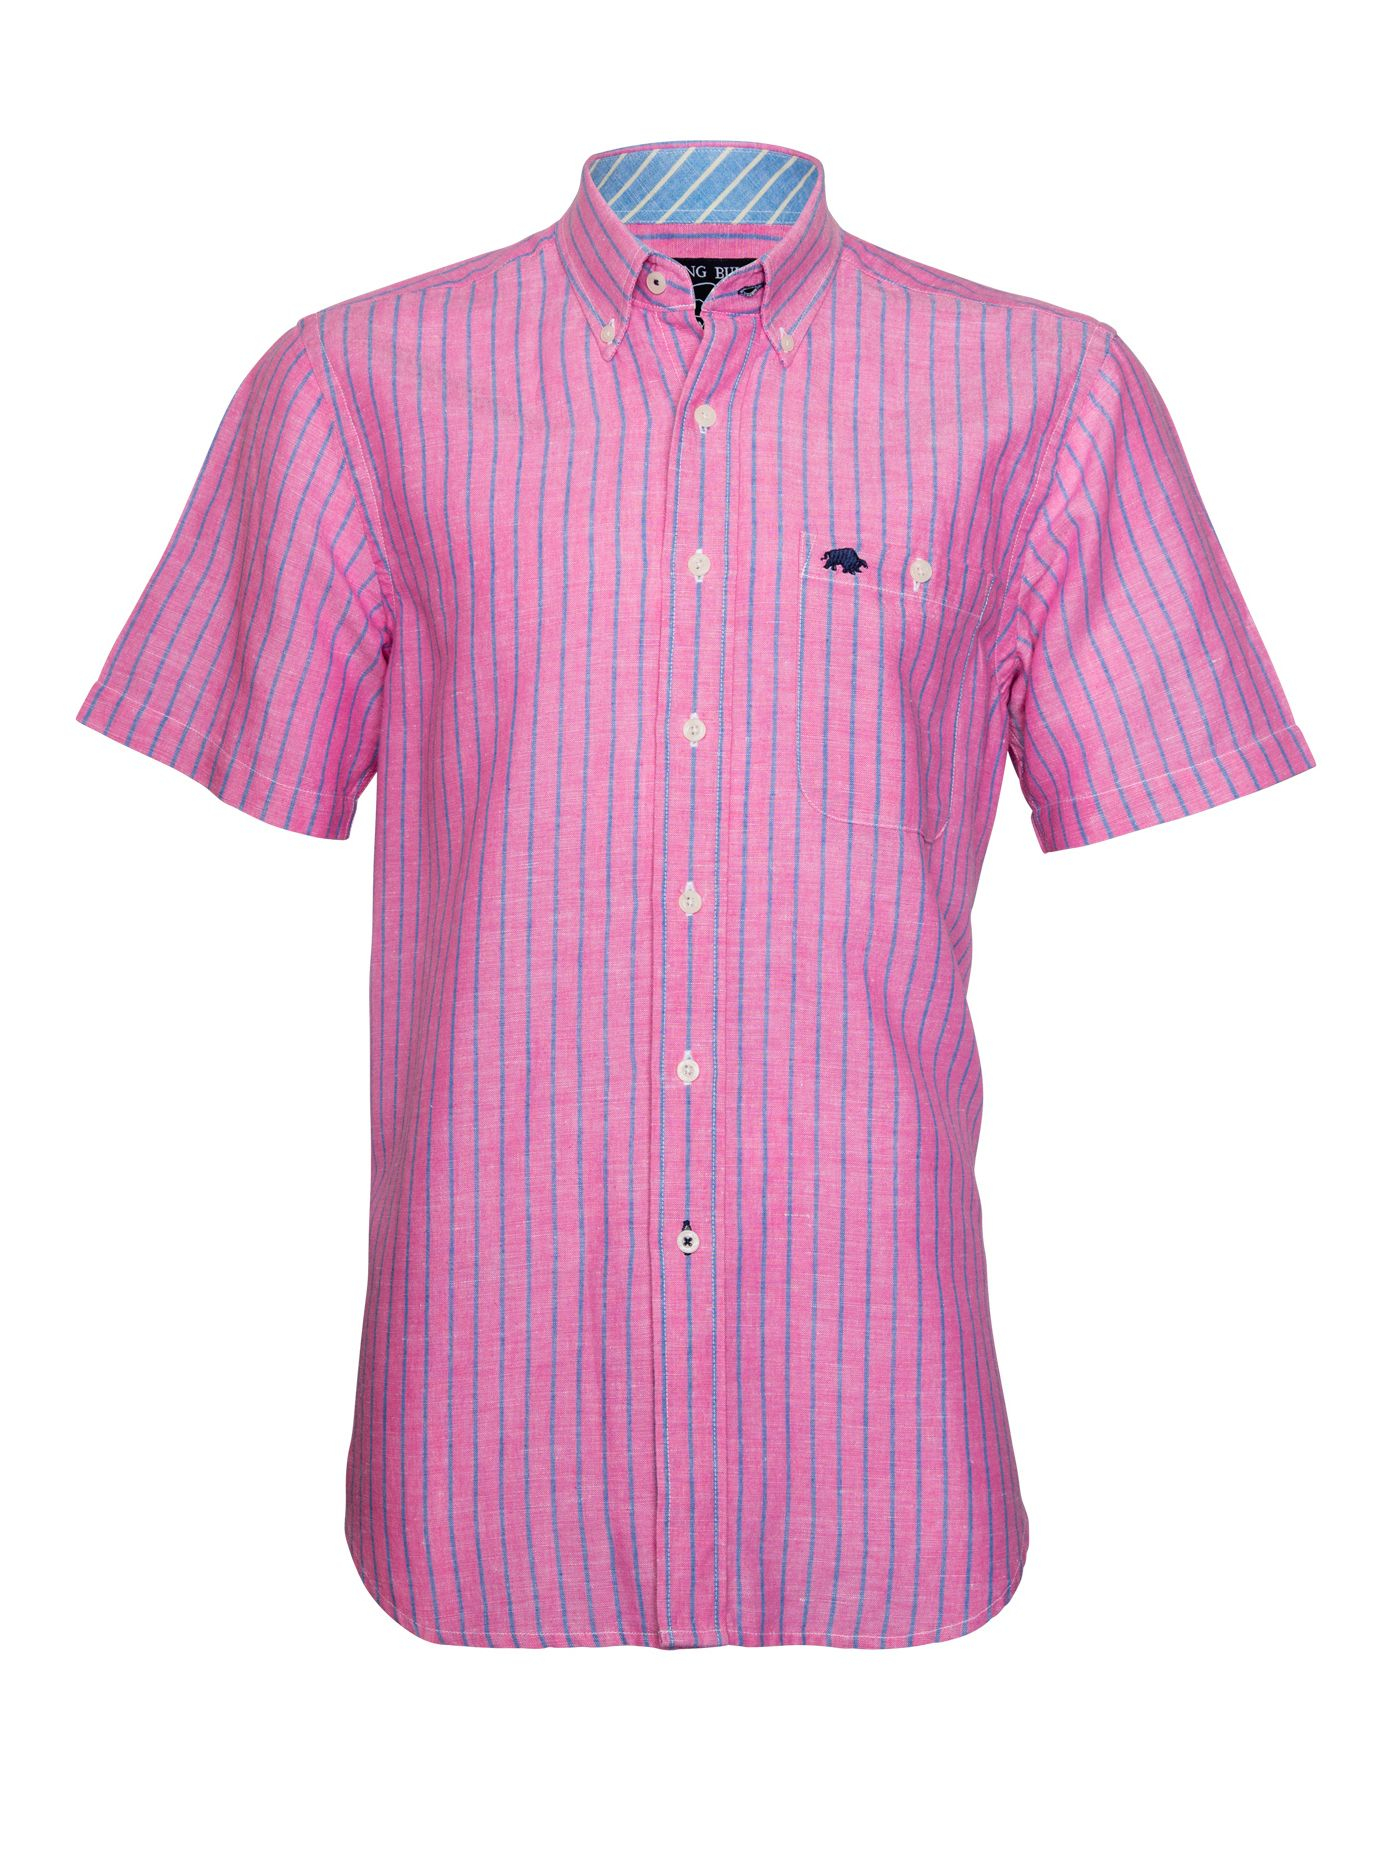 raging bull stripe short sleeve button down shirt in pink